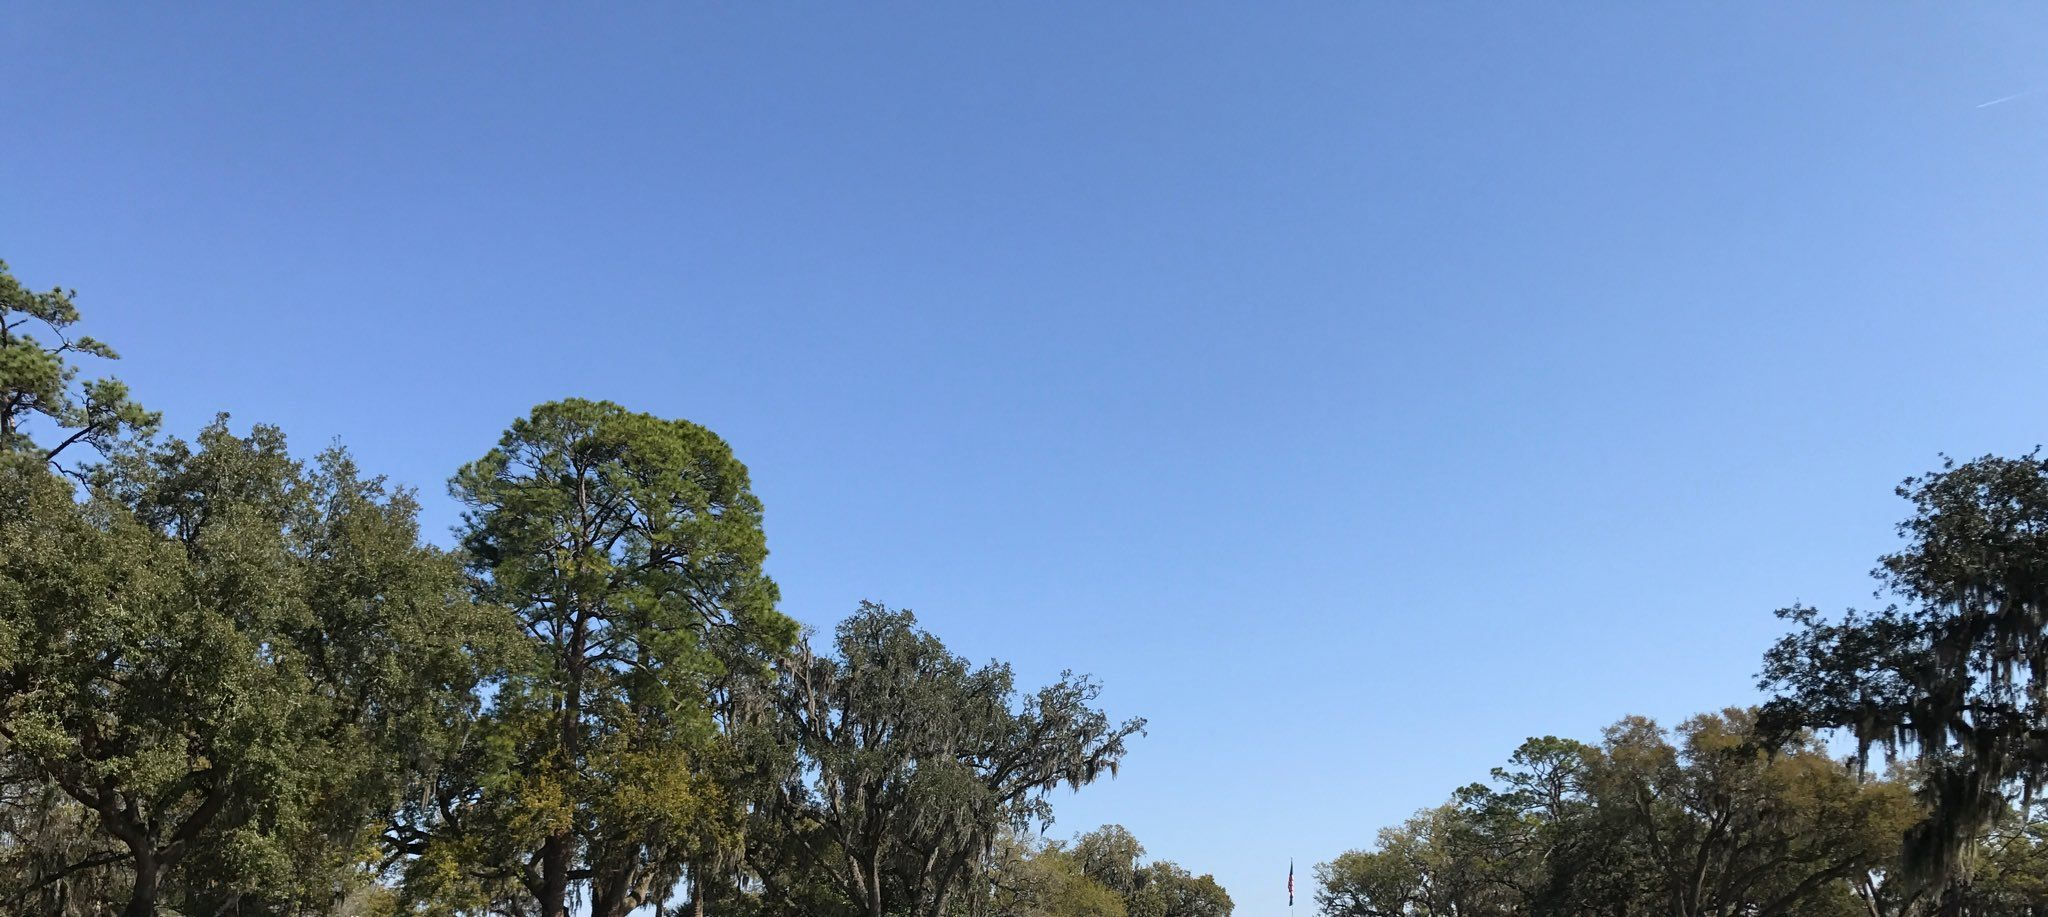 Jacksonville Weather!!  learnyourrights.com